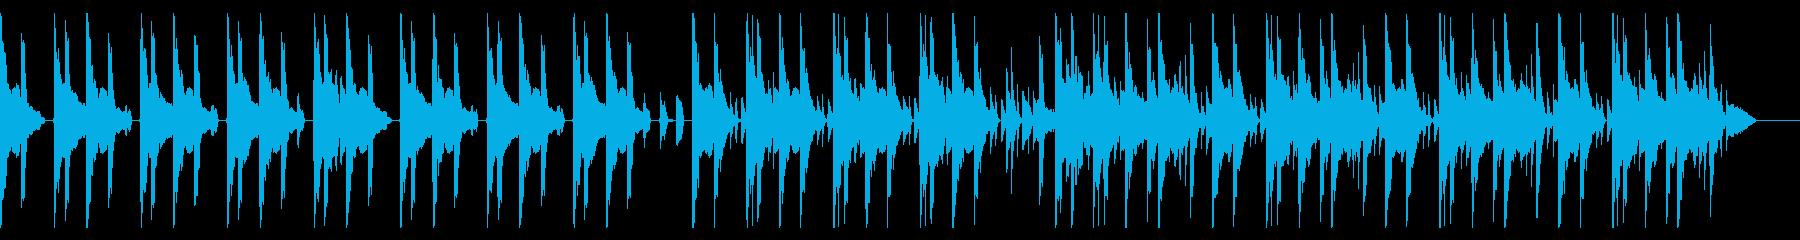 167 BPMの再生済みの波形